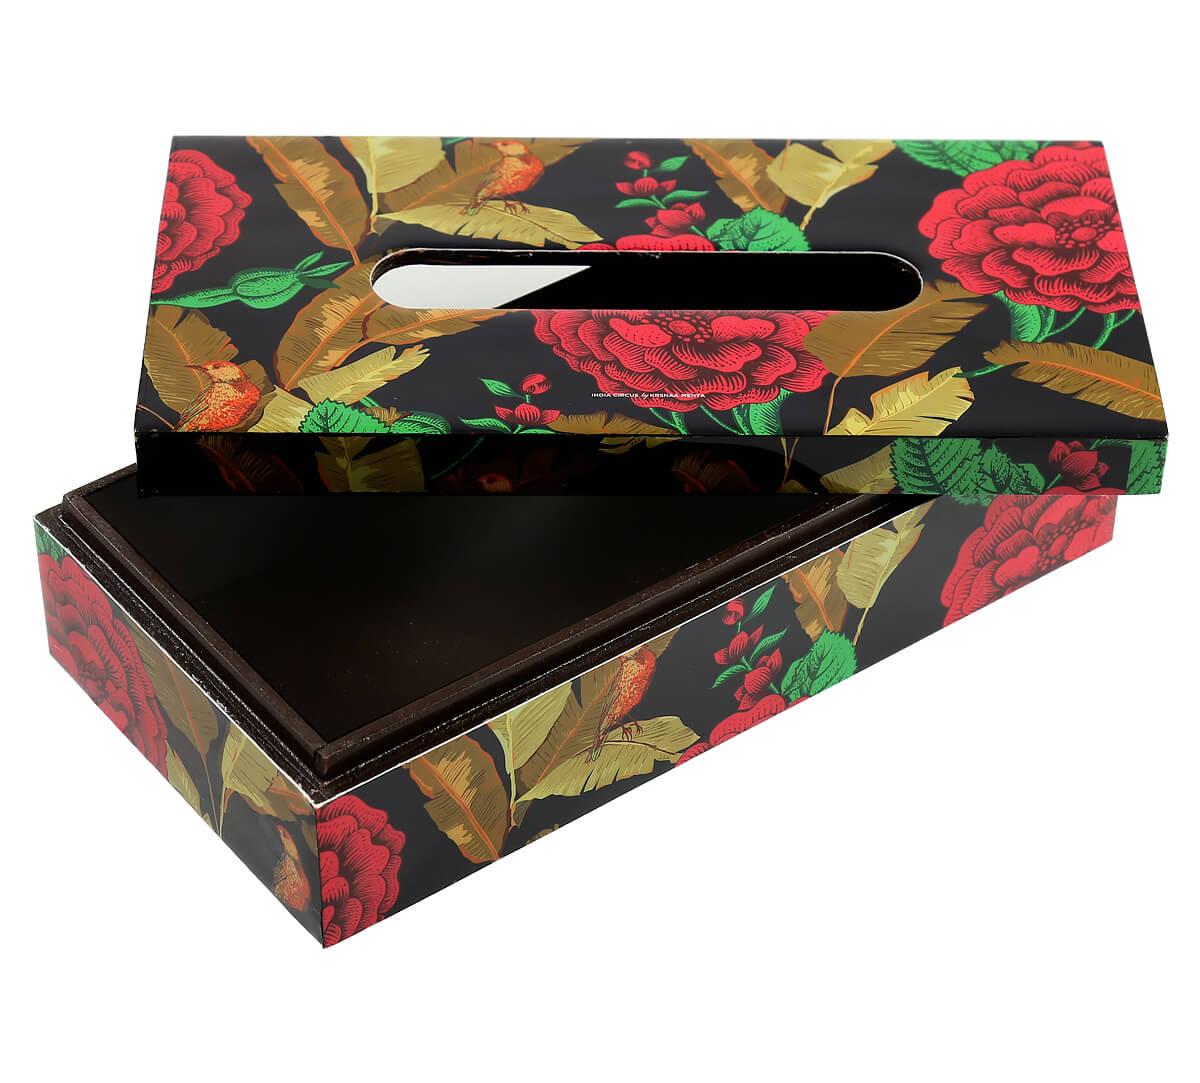 Violet Bayrose Romance Tissue Box Holder